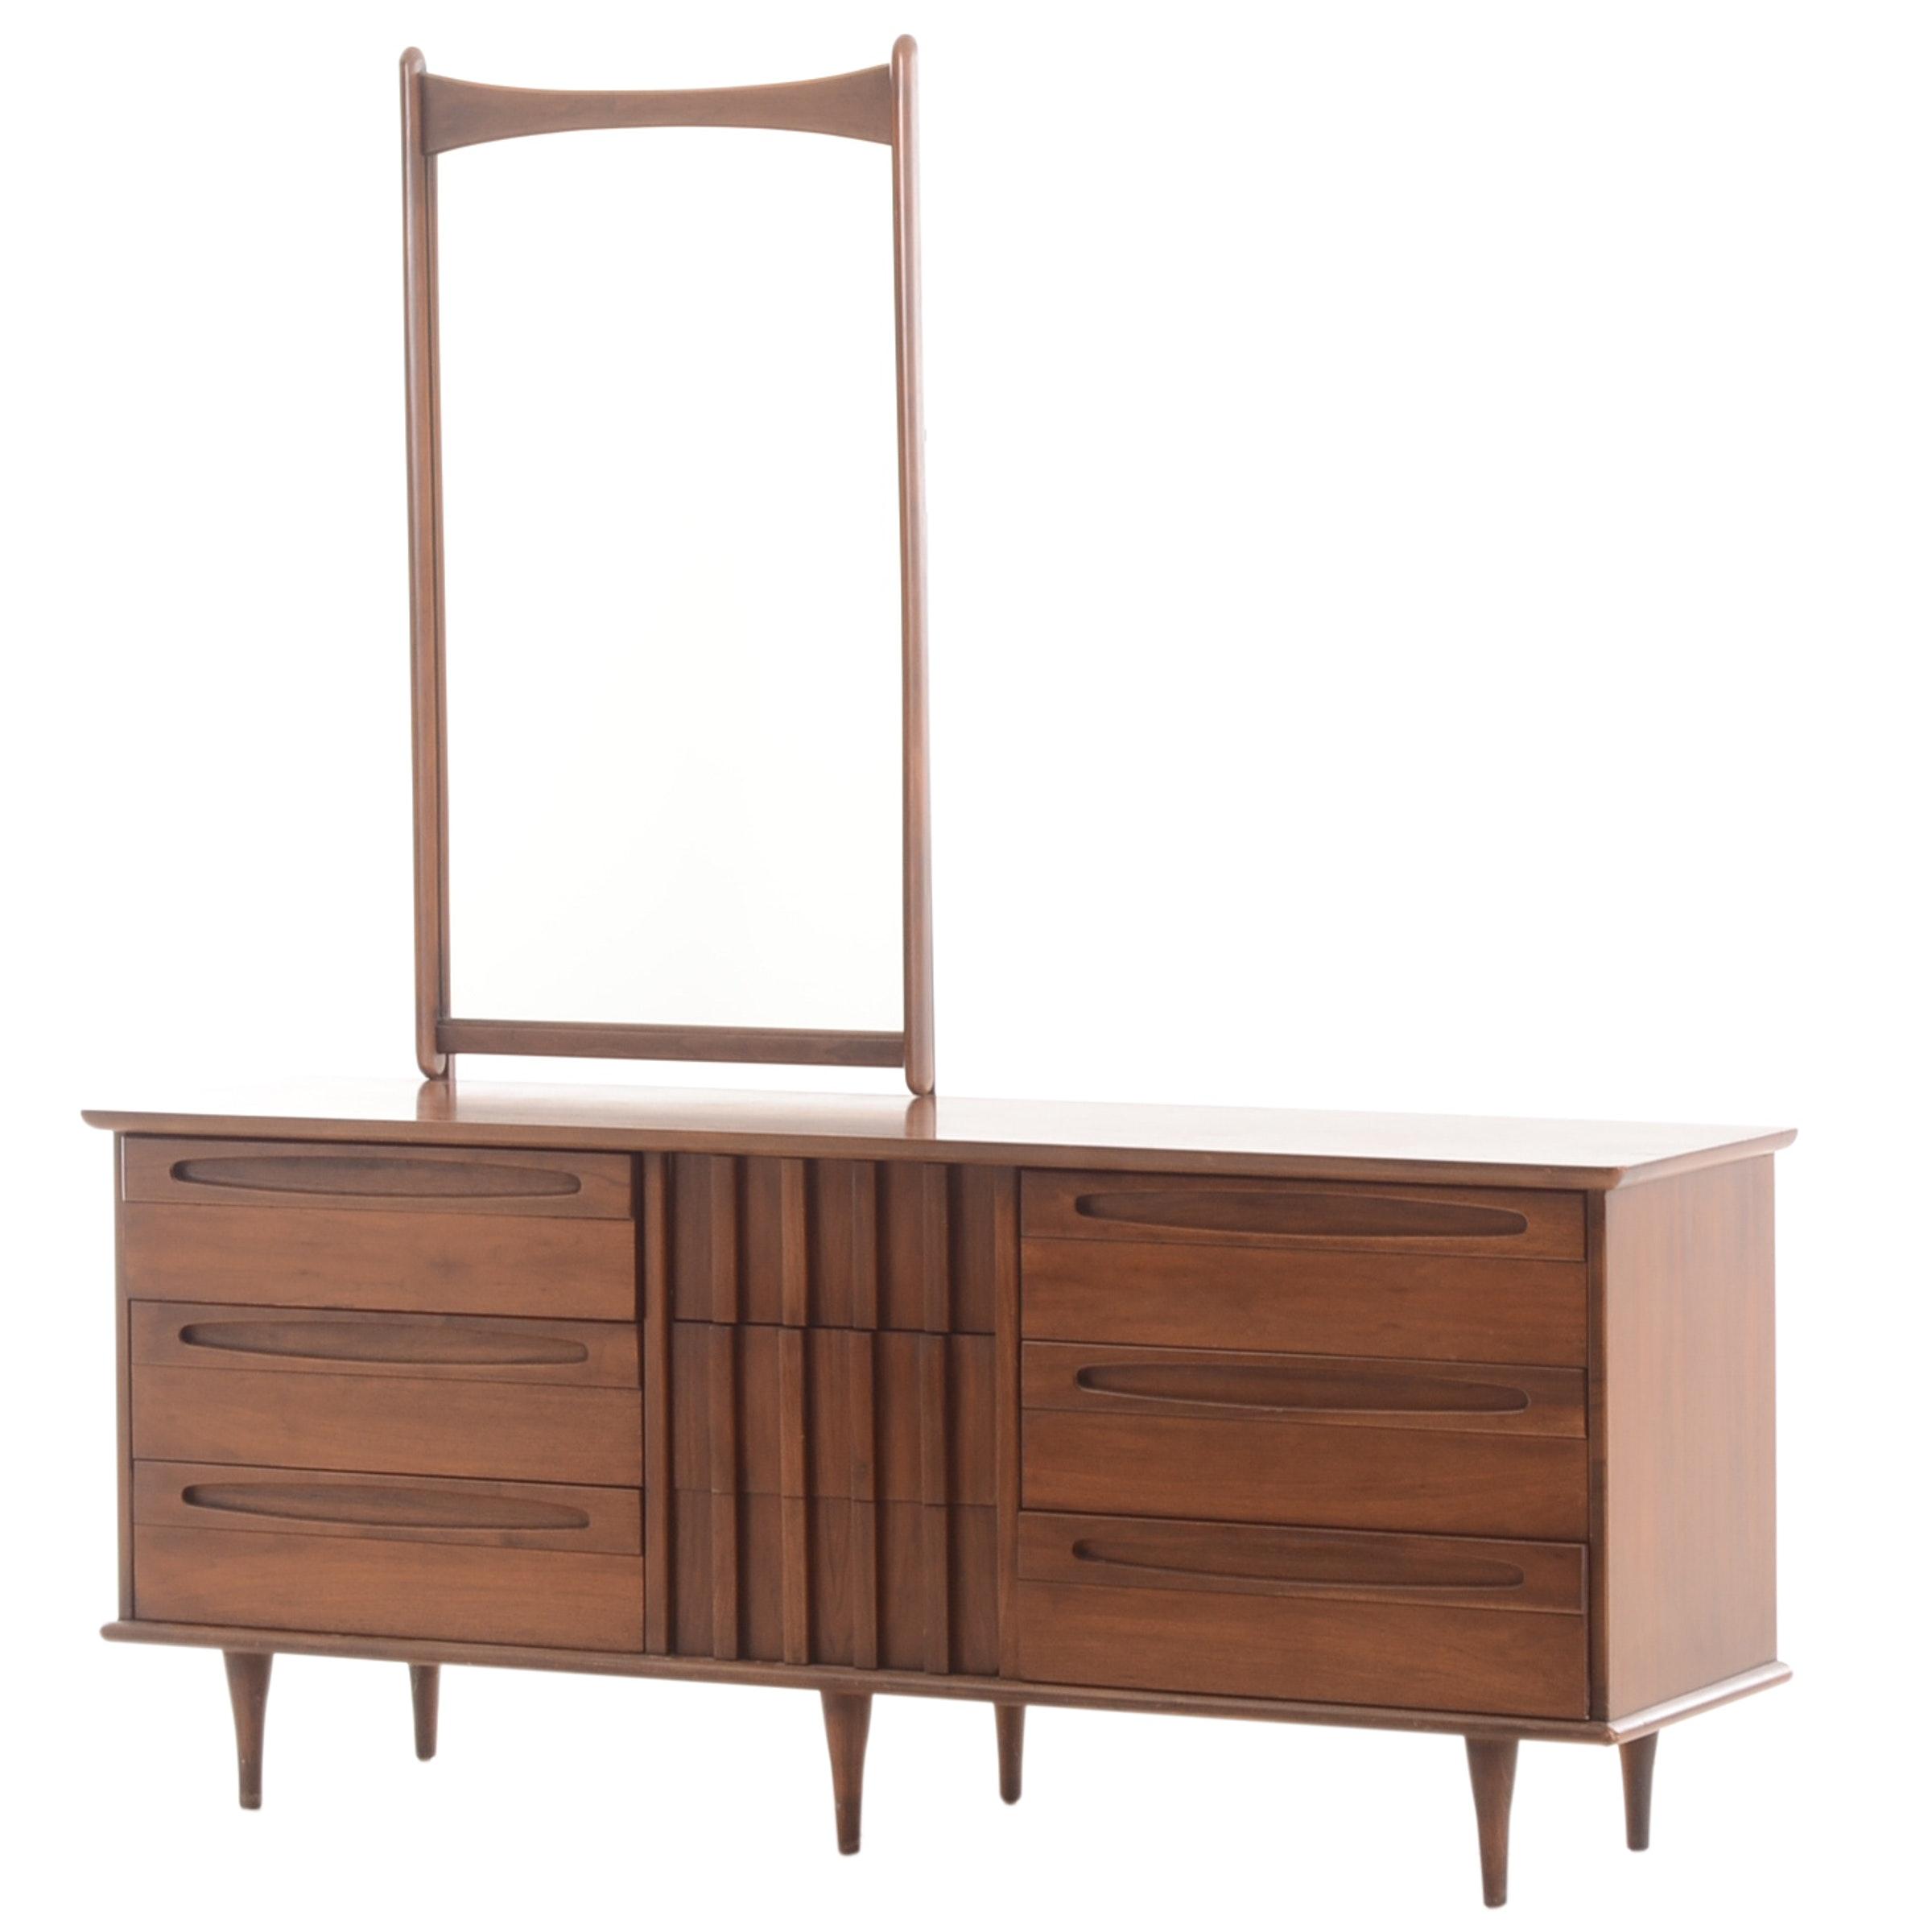 American of Martinsville Dresser with Mirror